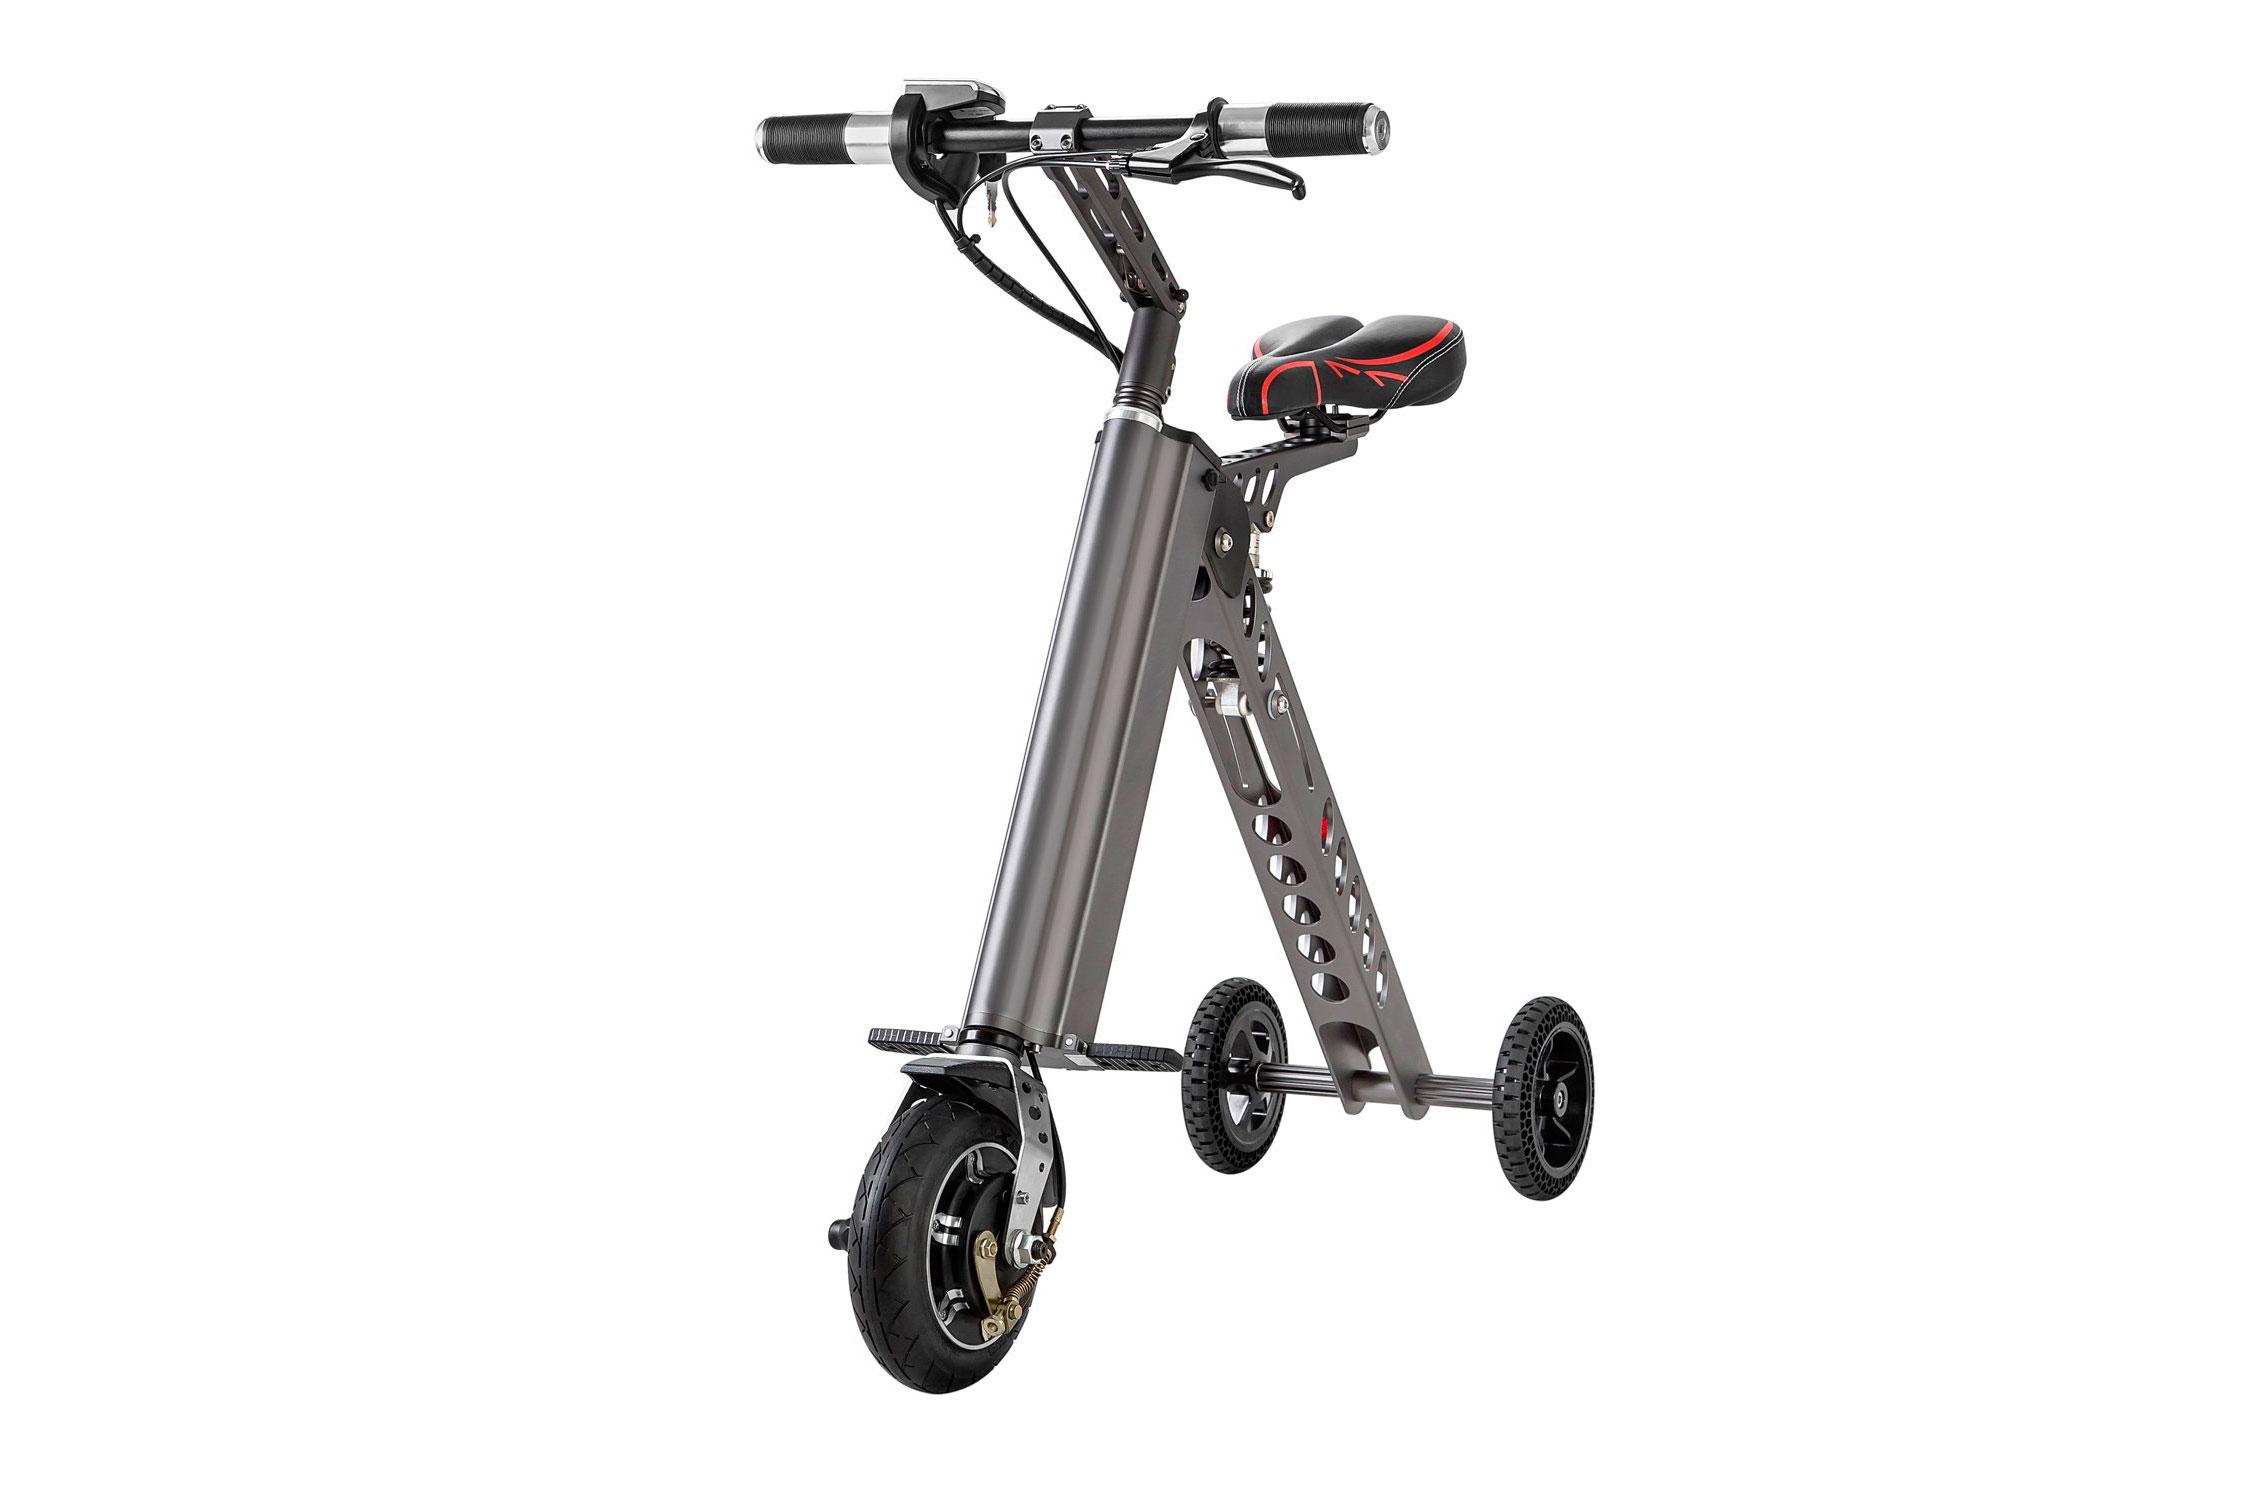 Topmate Mini Electric Tricycle